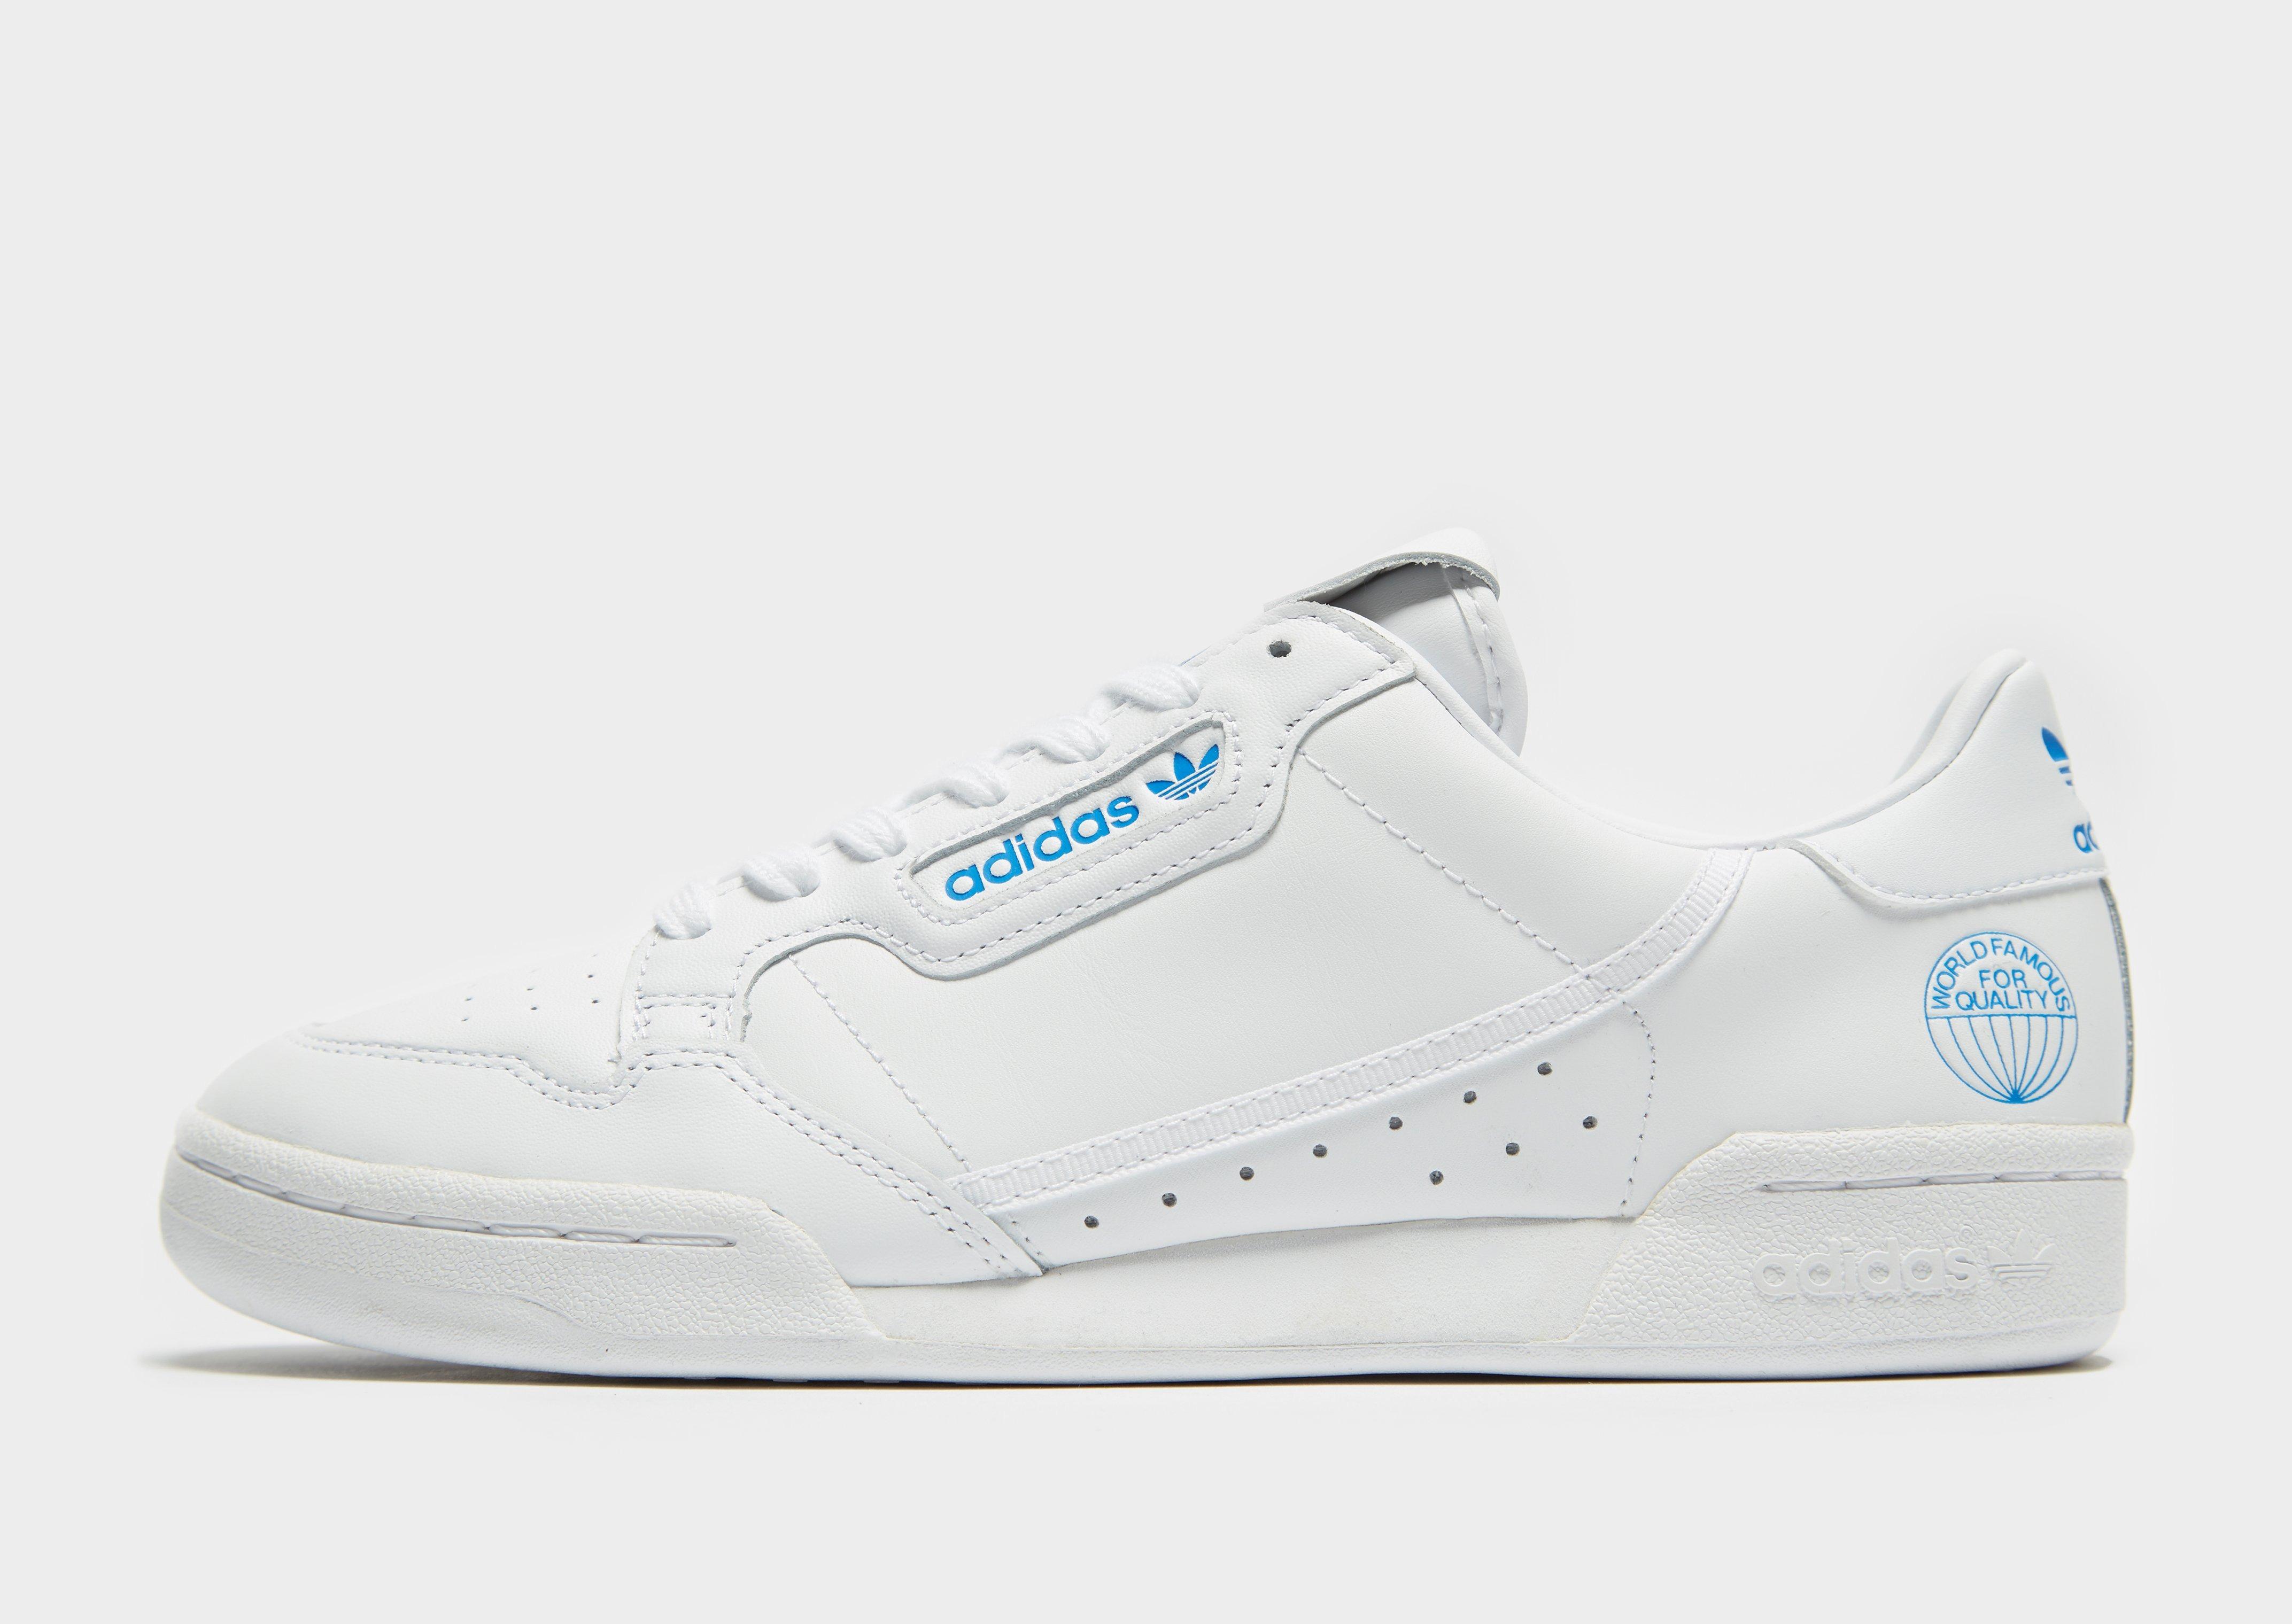 Sors Adidas Superstar Homme Bleu Clair Tout Promotion